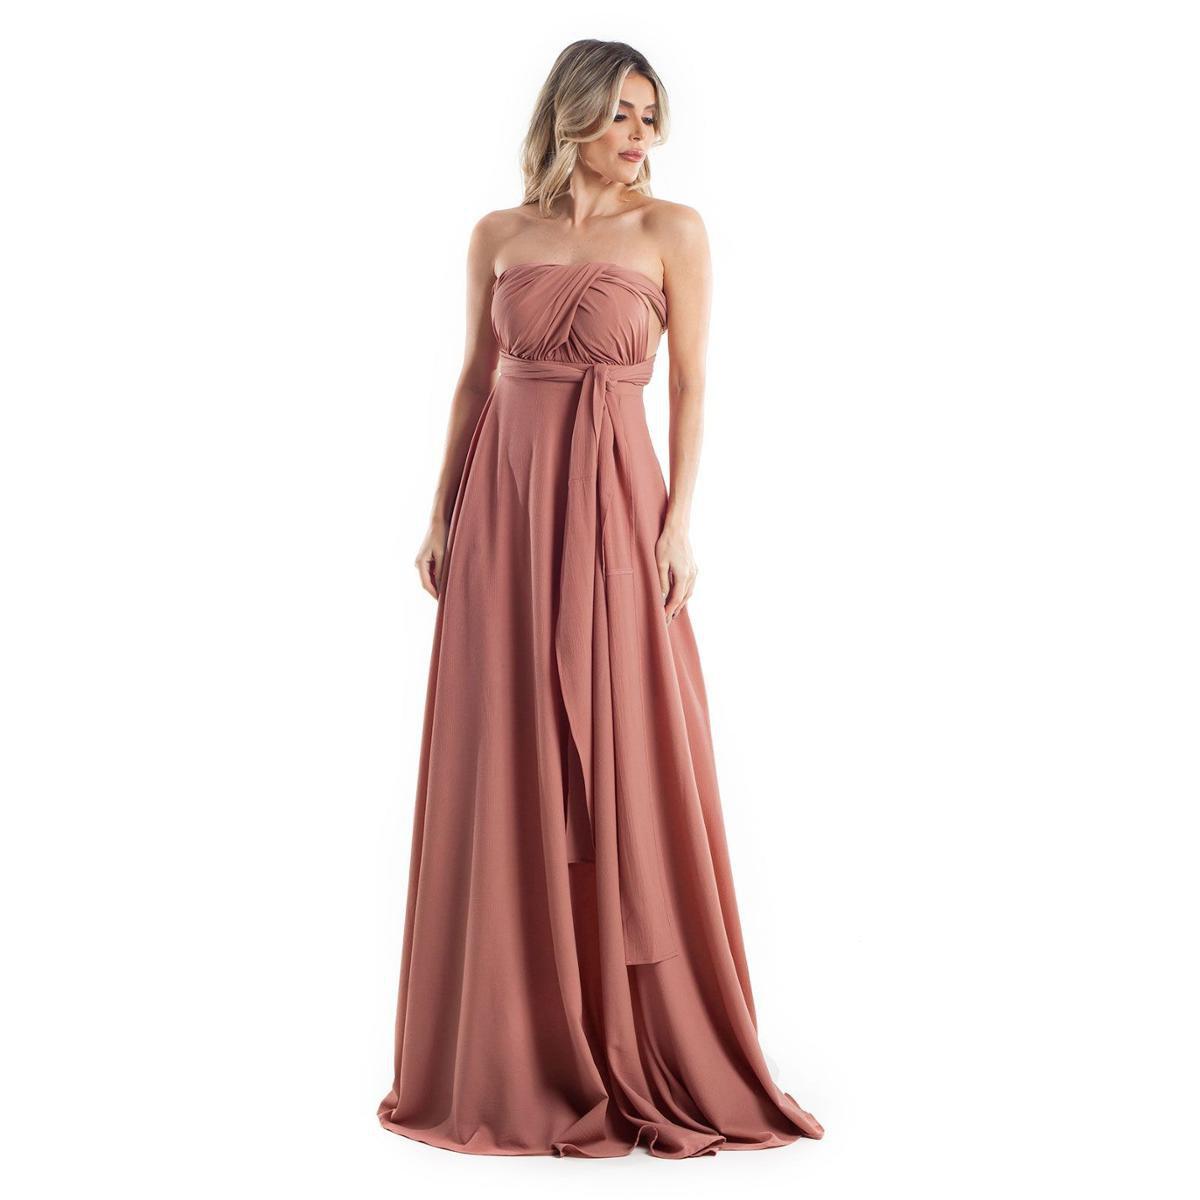 Vestido Longo Infinity Dress Lala Dubi Rose Gold